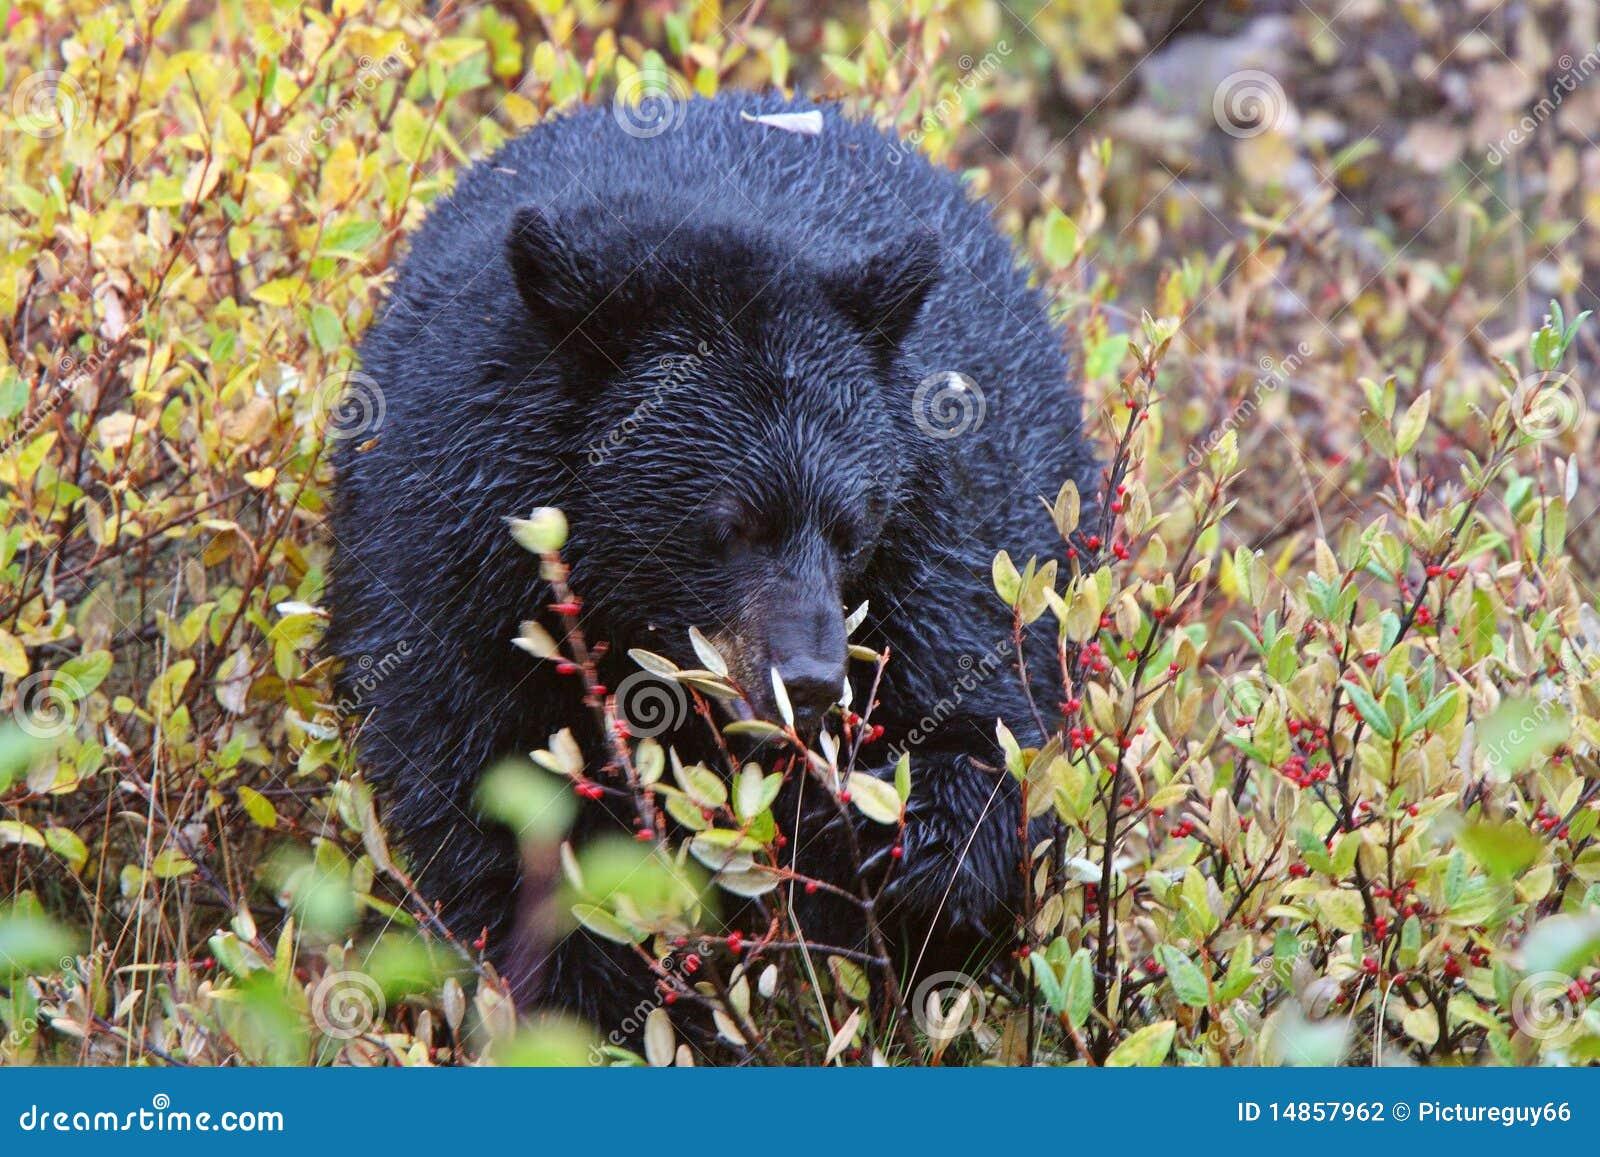 Black Bear along British Columbia highway